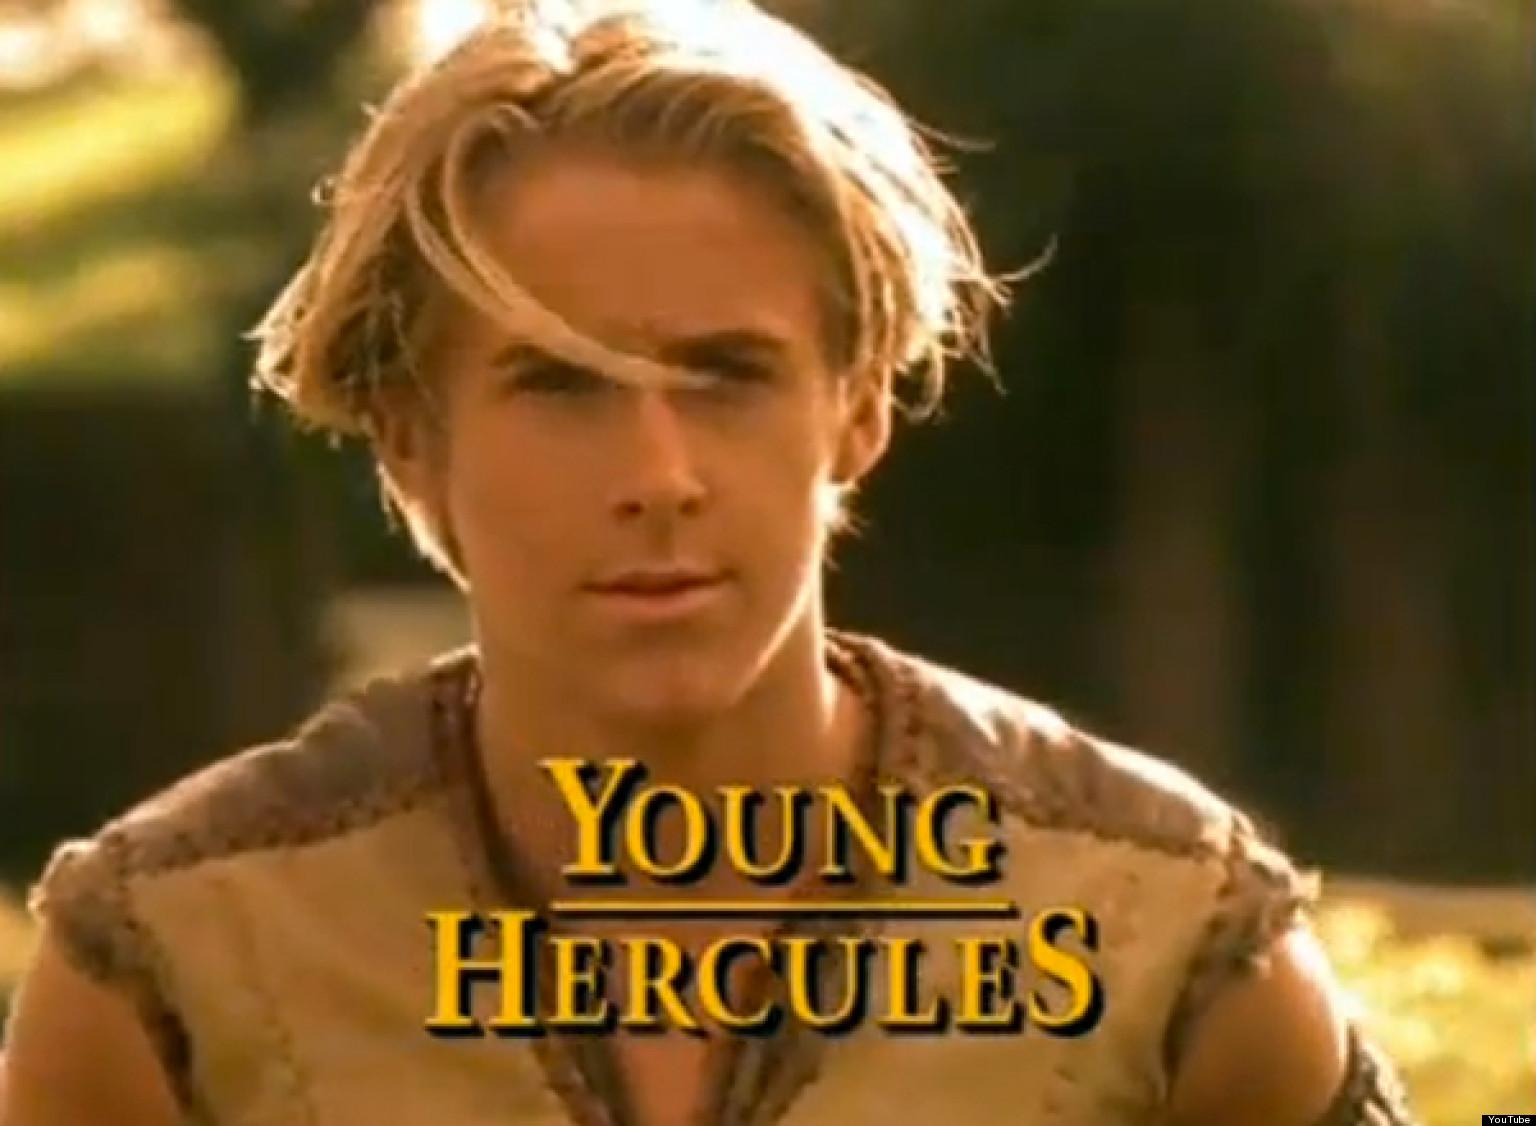 Hercules Movie Trailer Clip - YouTube